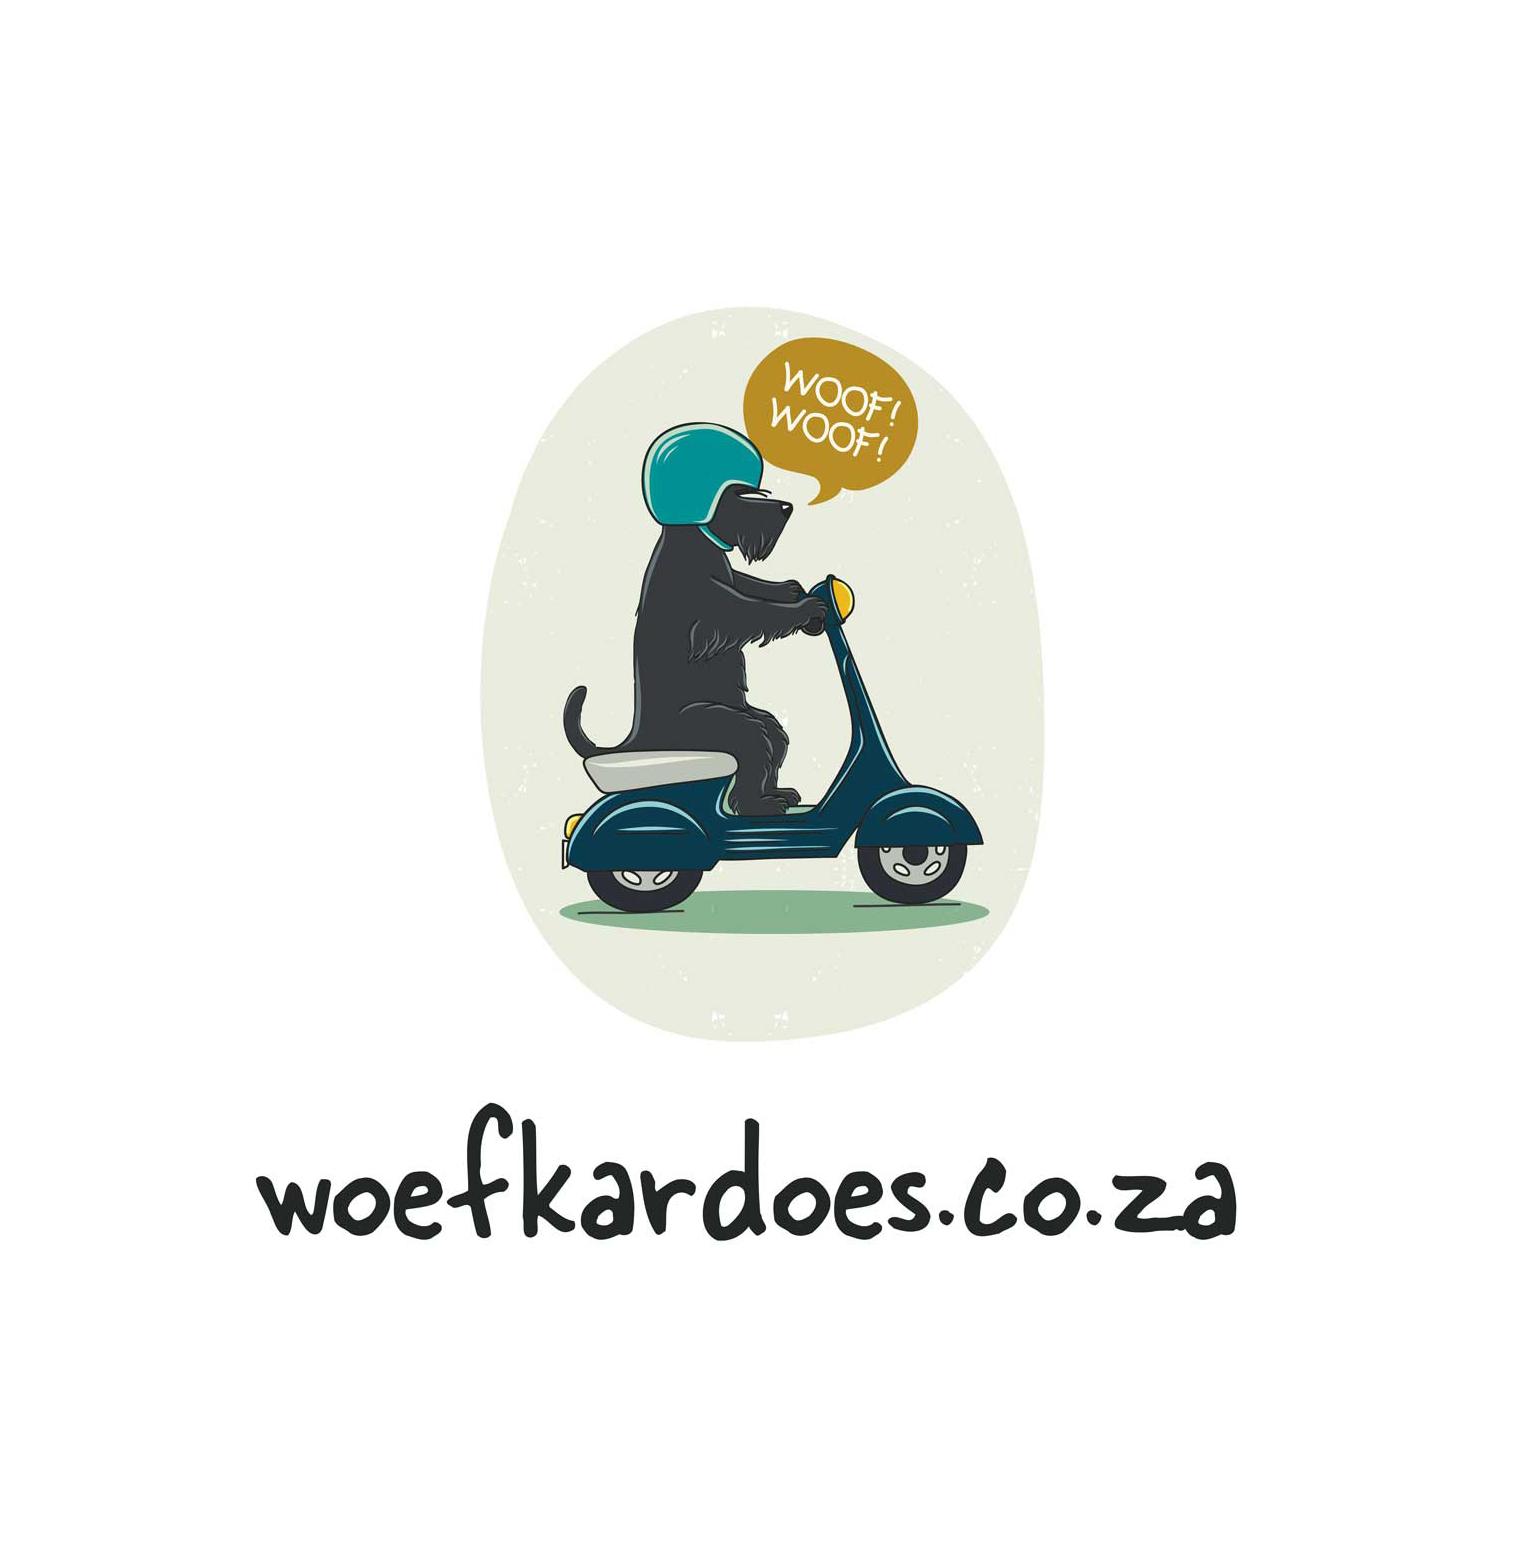 woefkardoes_lockedup_logo